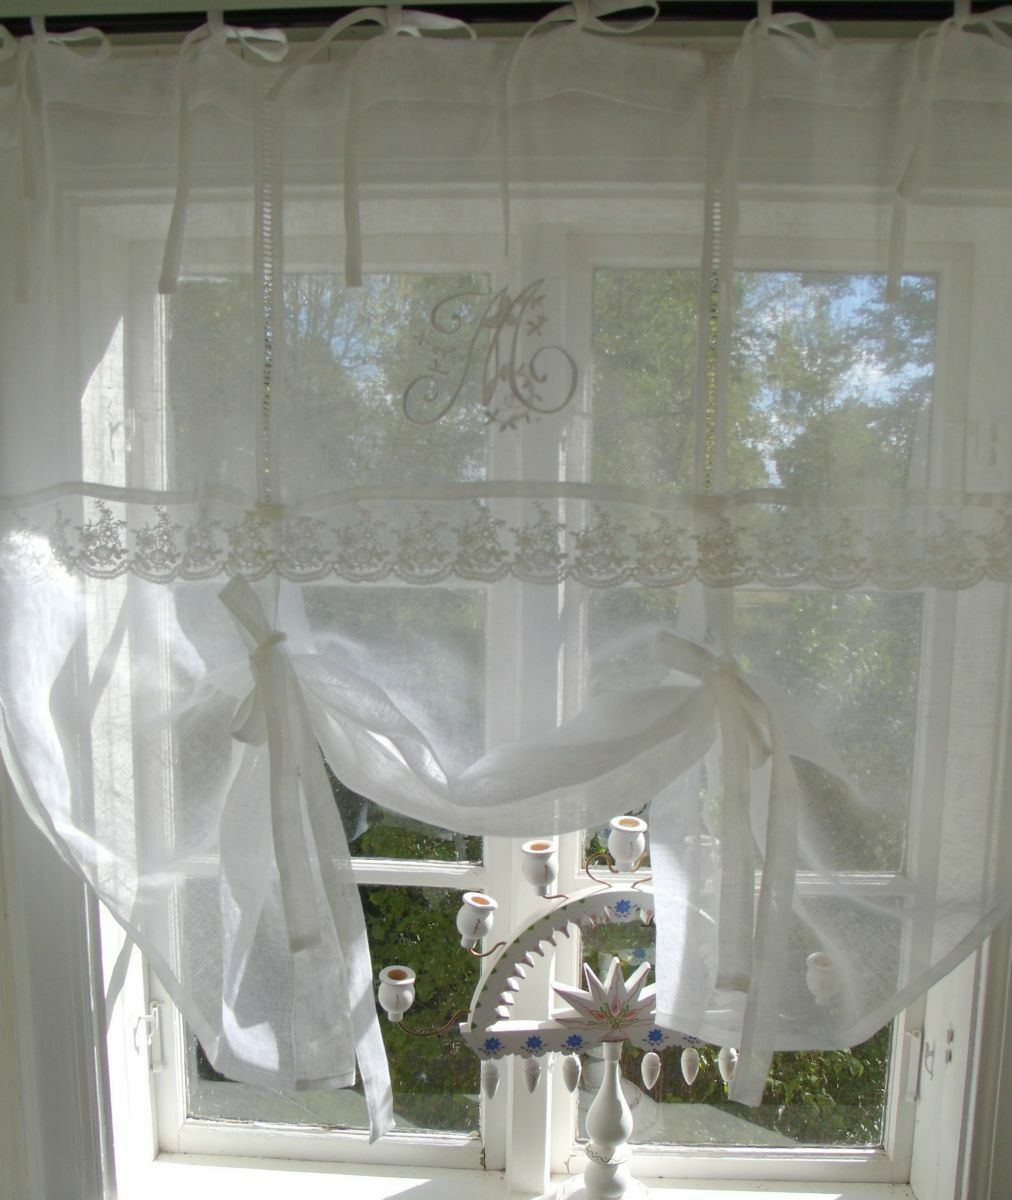 raffgardine 90 cm breit cool raff gardine heart blau cm breit shabby chic vintage curtain with. Black Bedroom Furniture Sets. Home Design Ideas